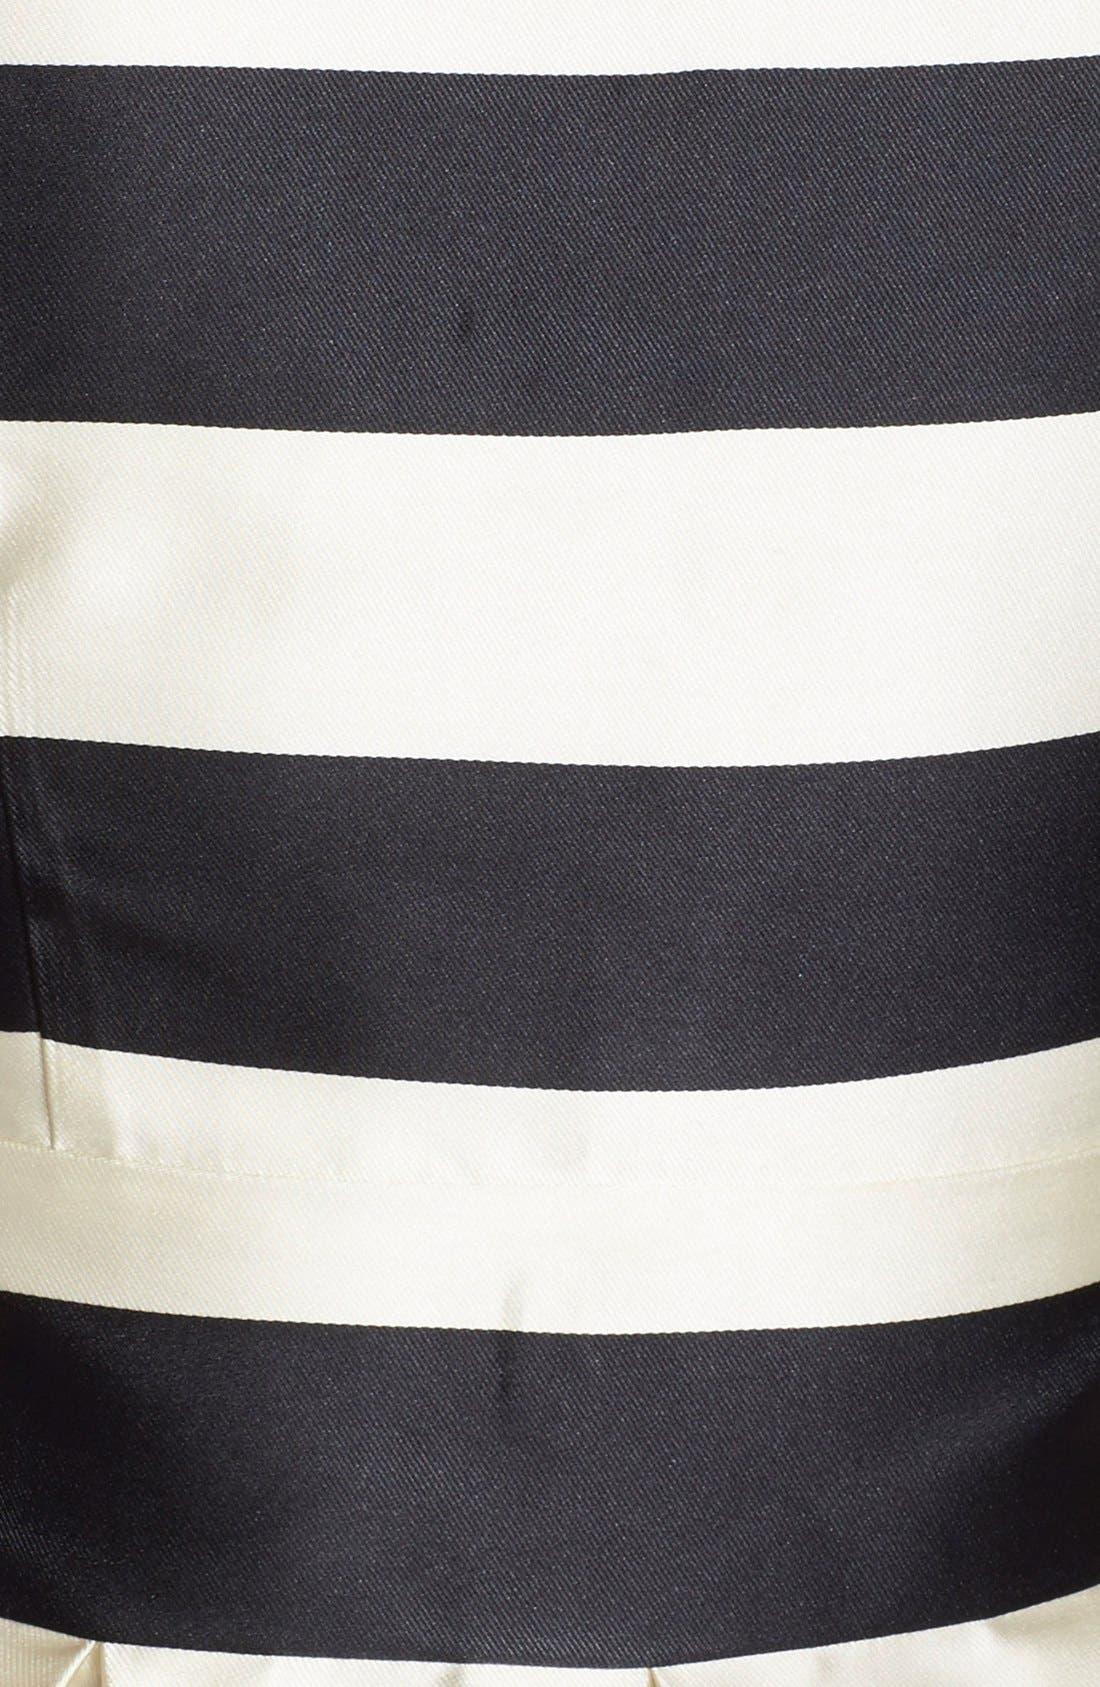 Stripe Crepe Fit & Flare Dress,                             Alternate thumbnail 5, color,                             011